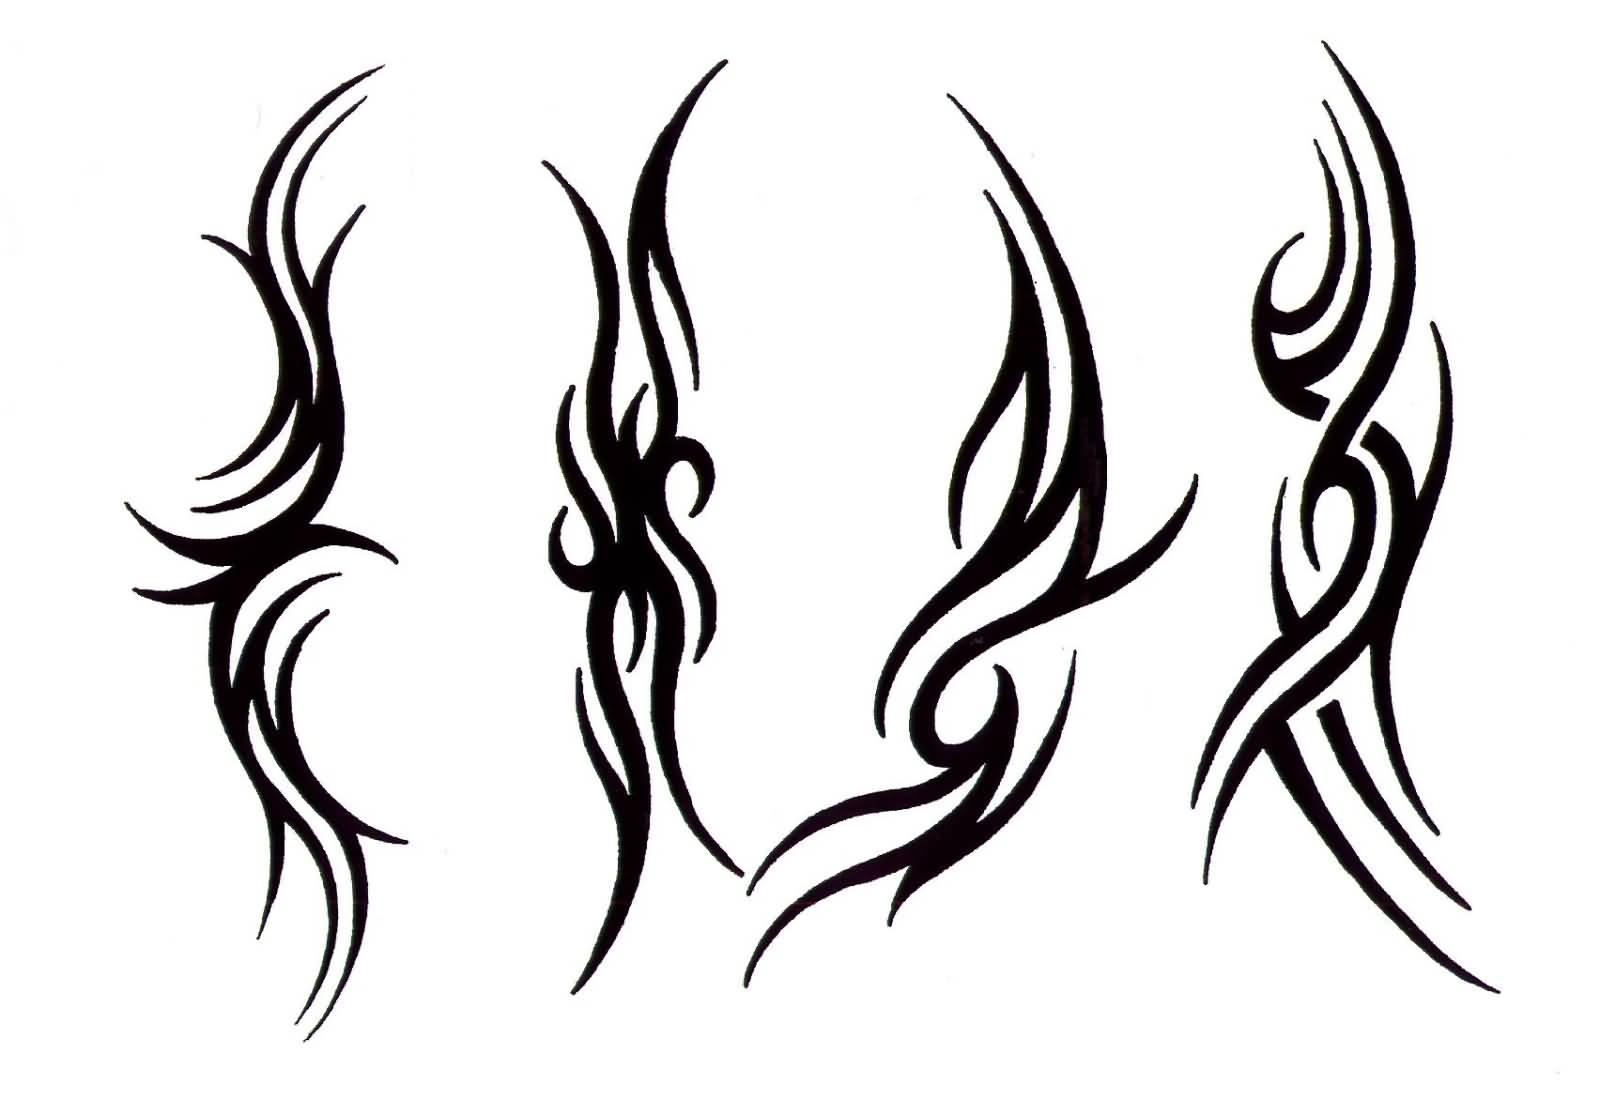 Tribal-Tattoos yio6KEEoT